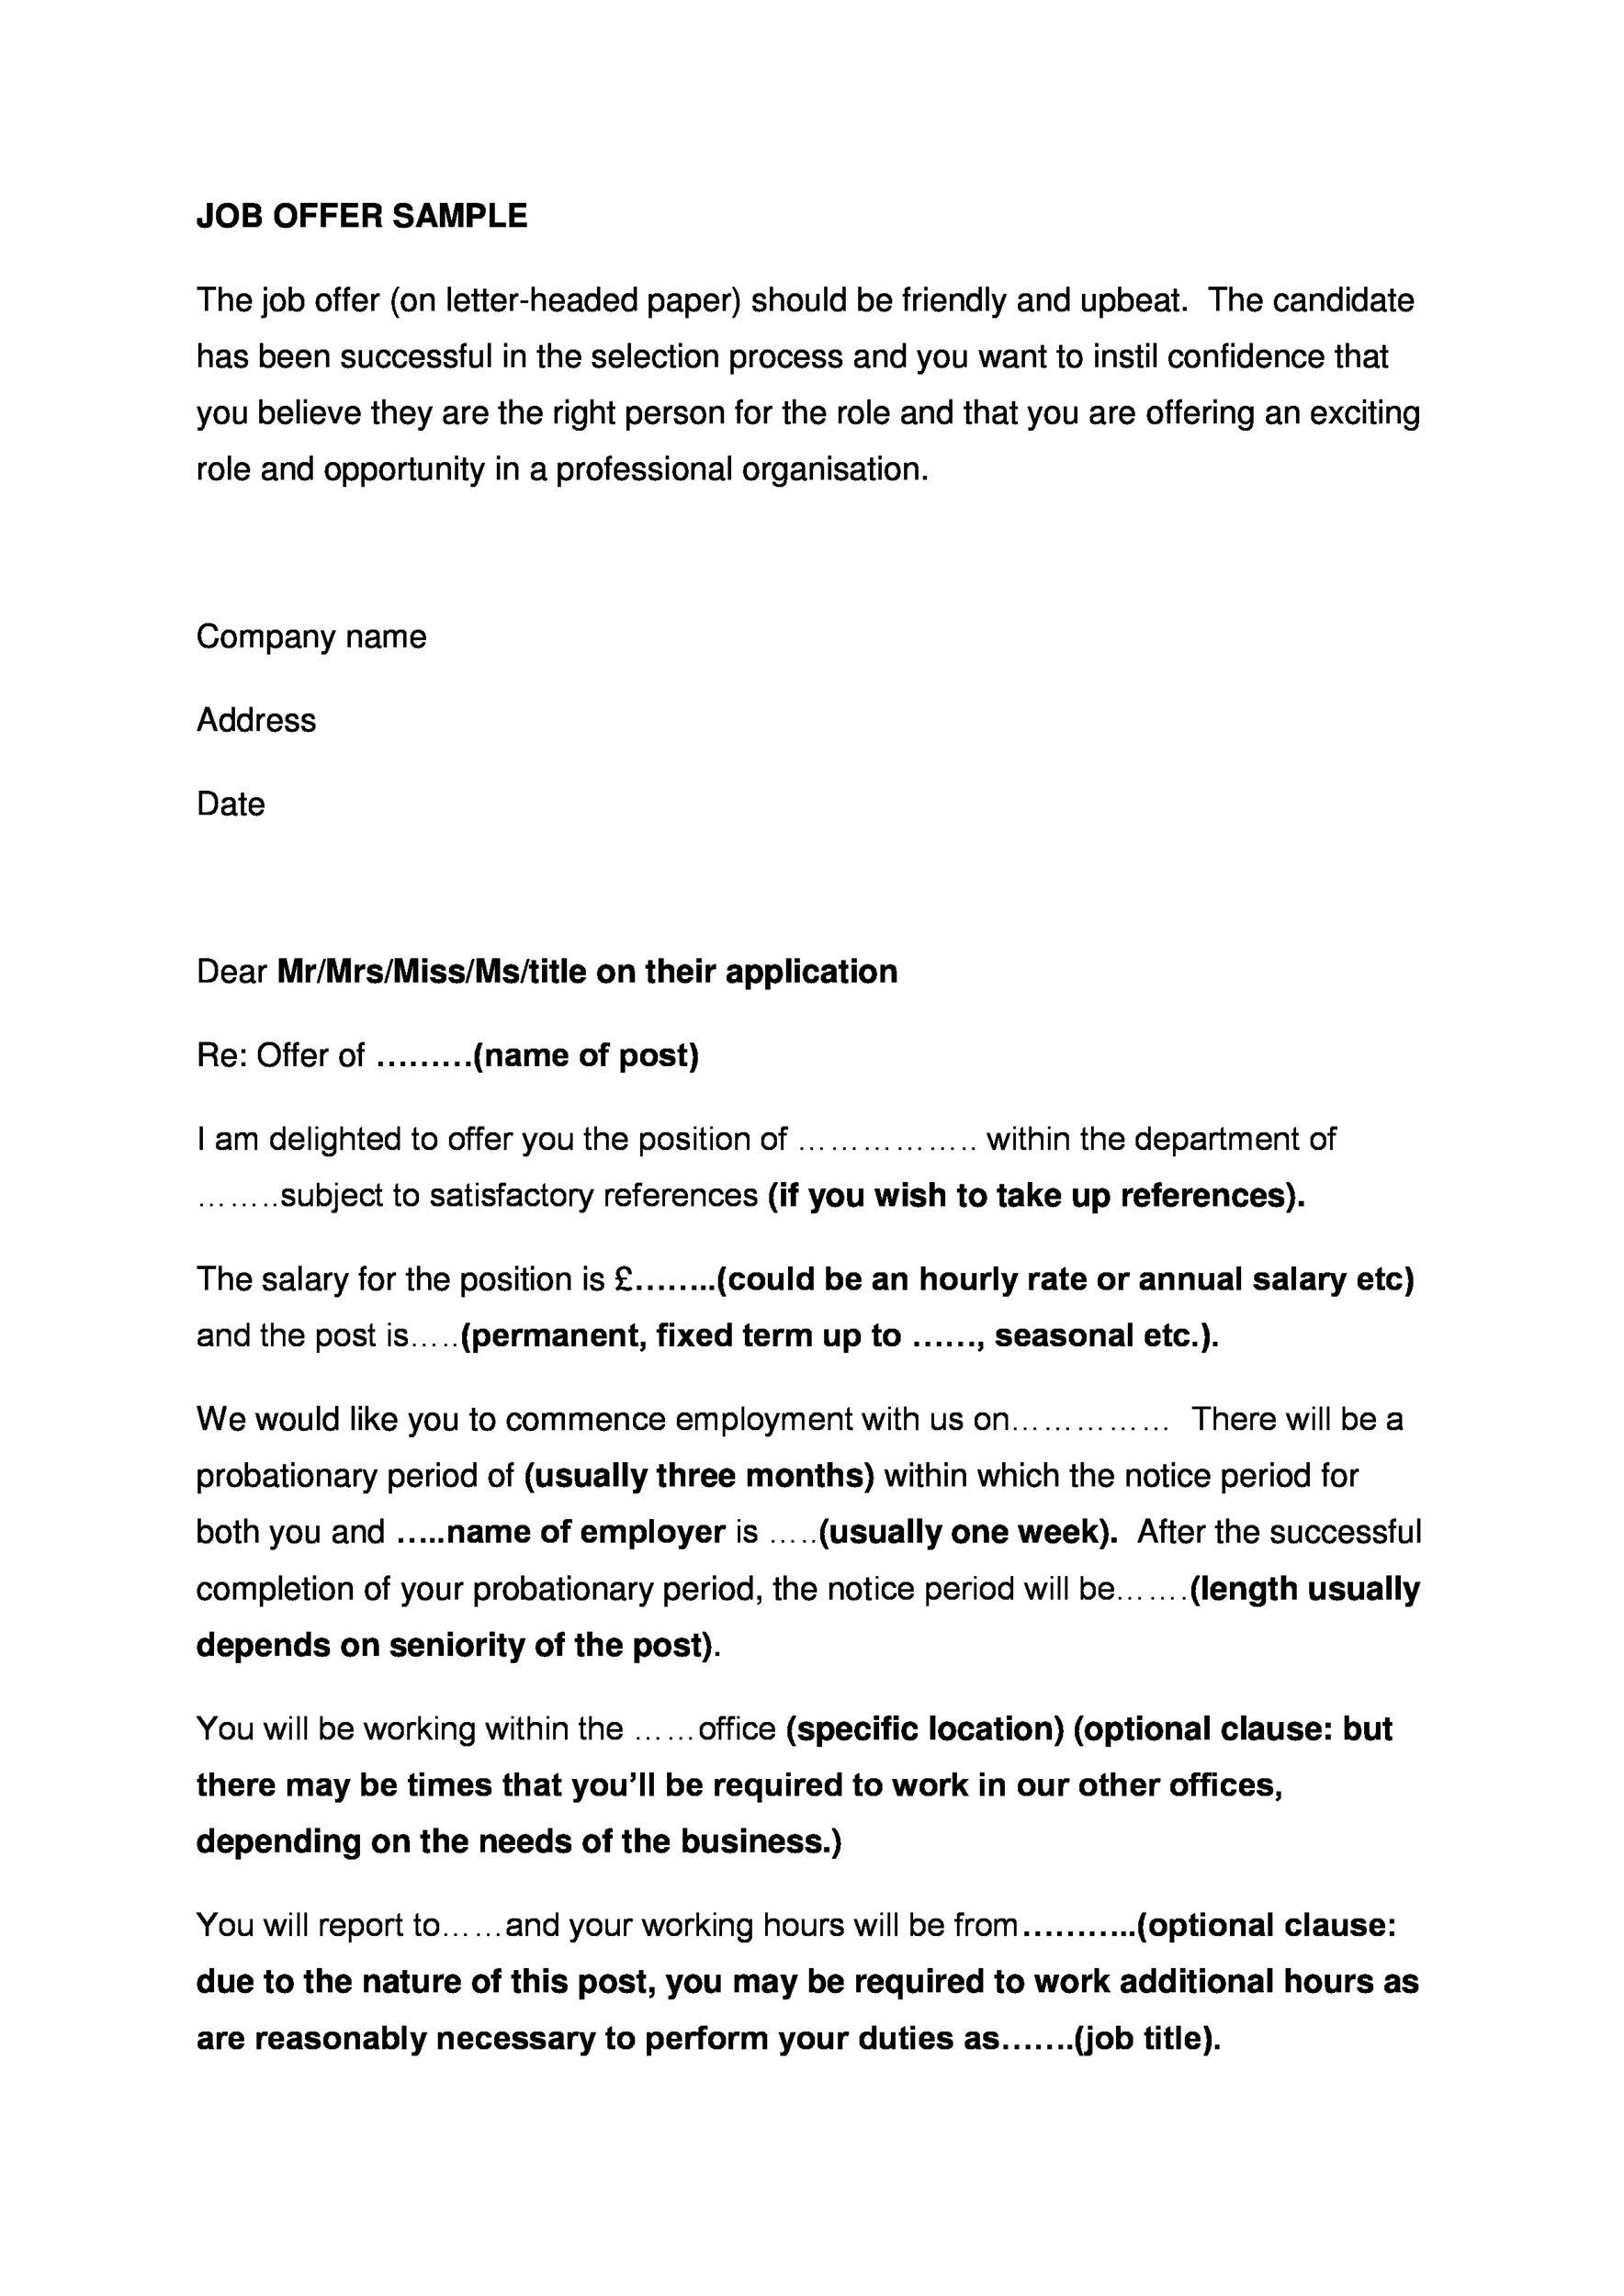 Free Offer letter 04